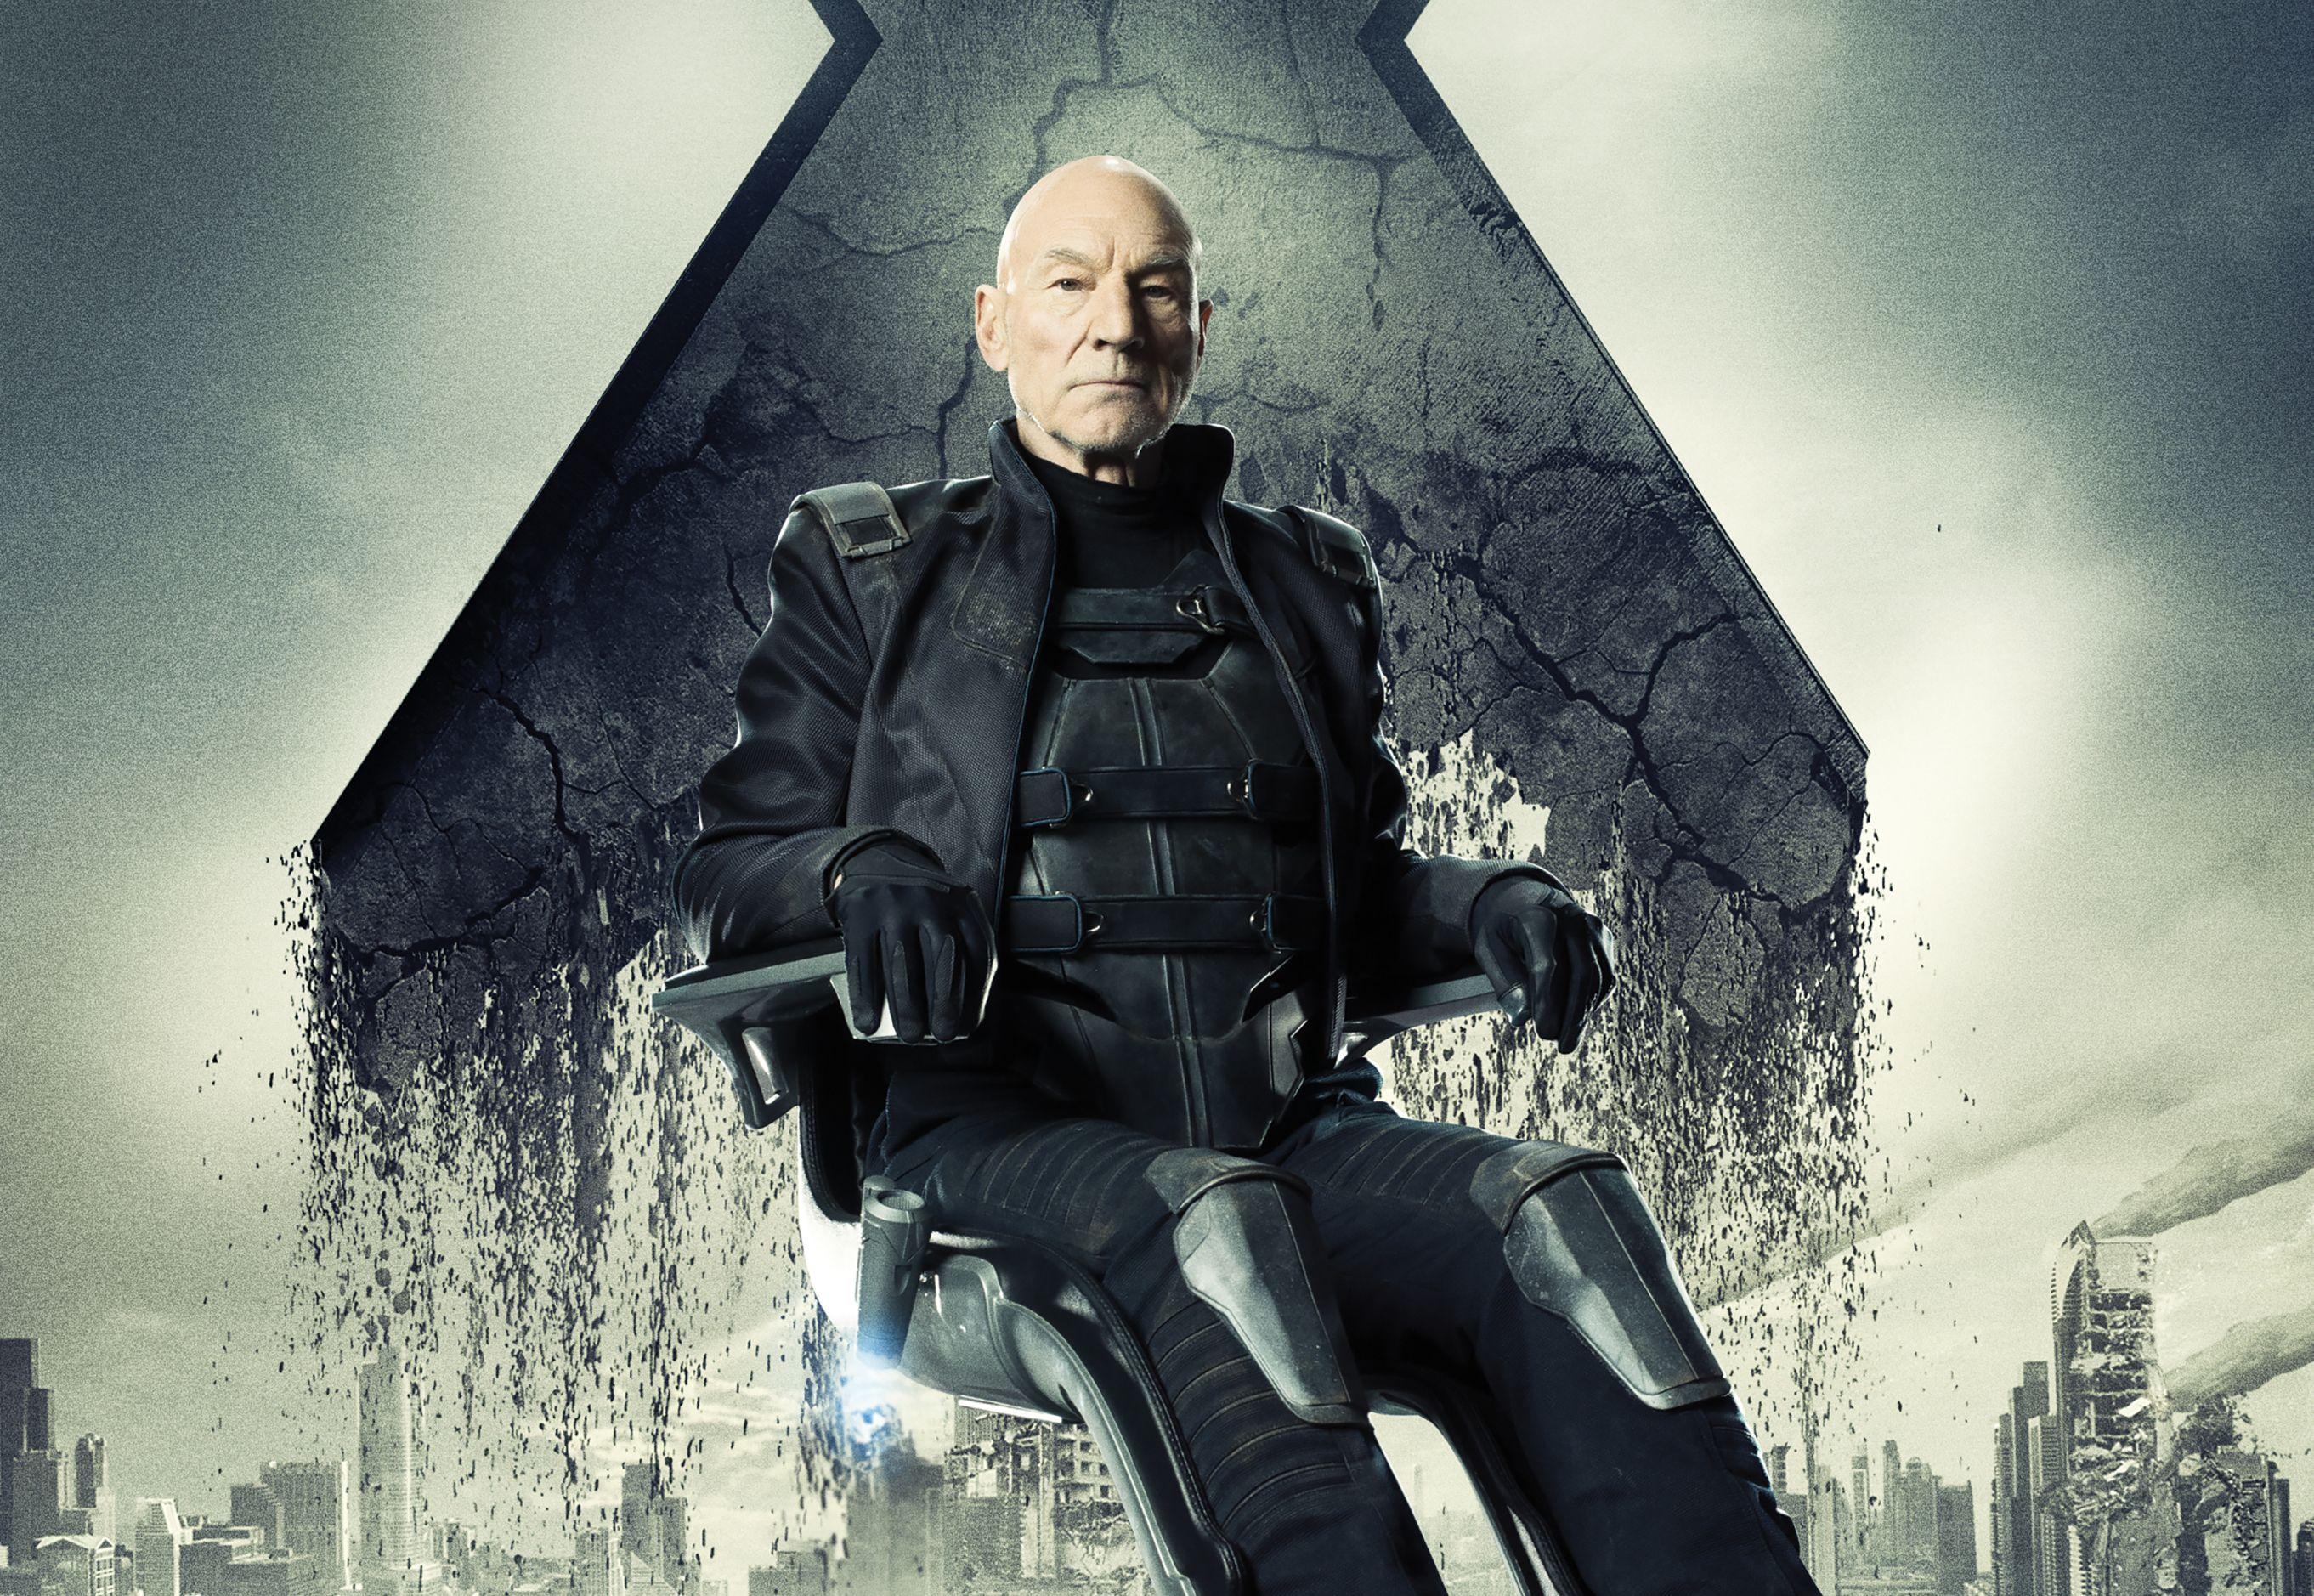 X Men Days Of Future Past Old Charles Xavier Professor X Wallpaper 2723x1878